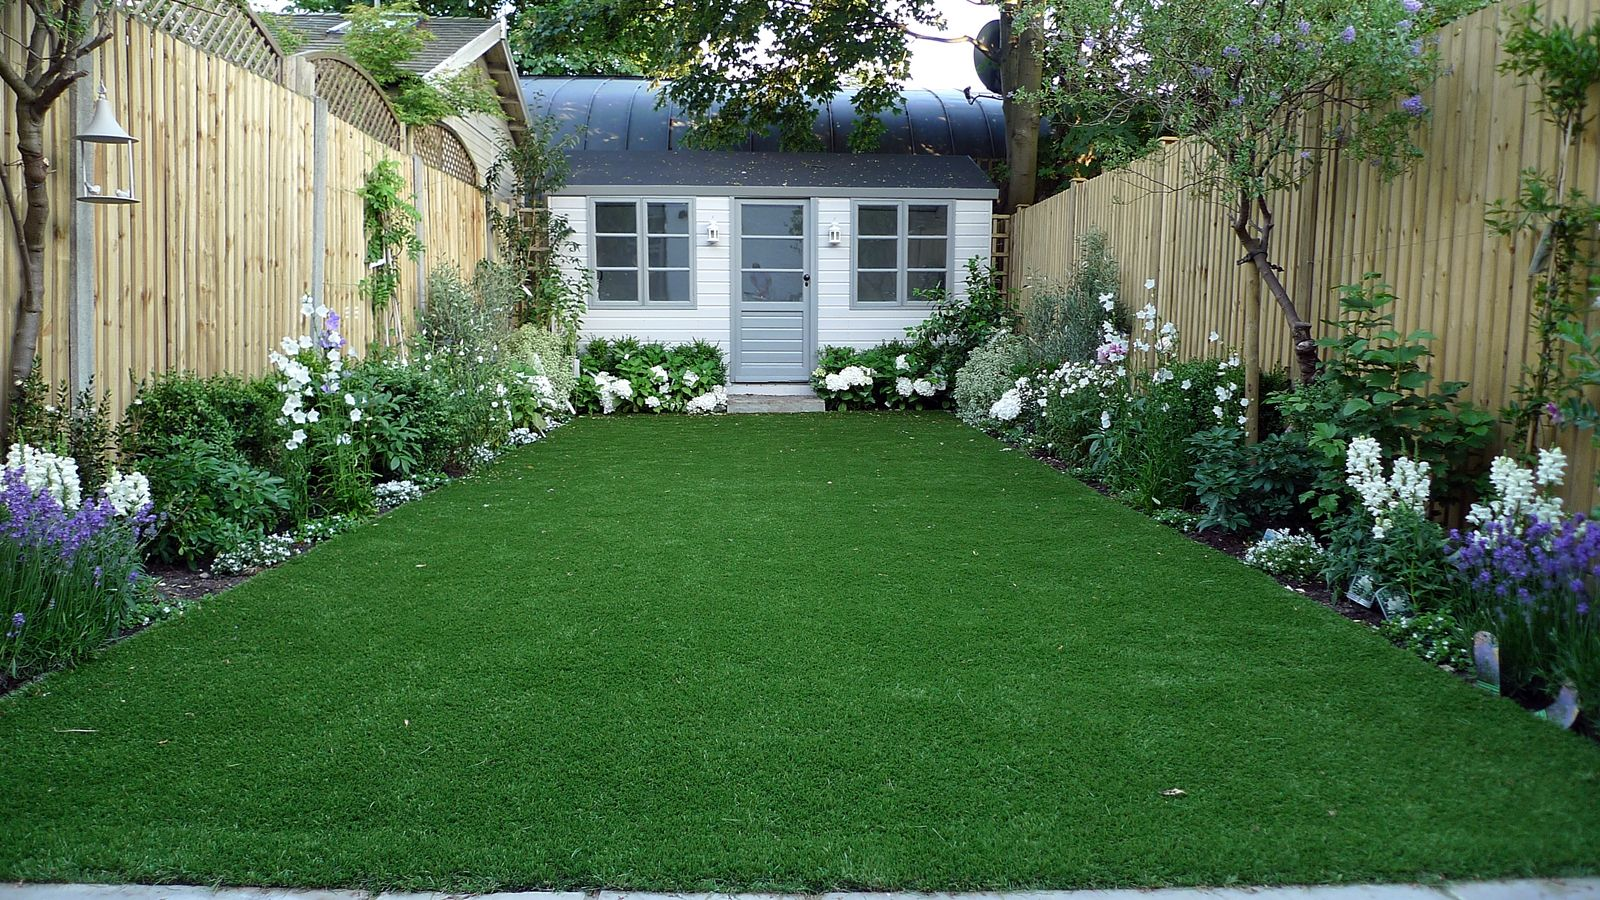 Artificial Easy Grass Lawn Summer House Sandstone Paving And White Flower Planting Scheme London Lond Backyard Landscaping Designs London Garden Garden Fence